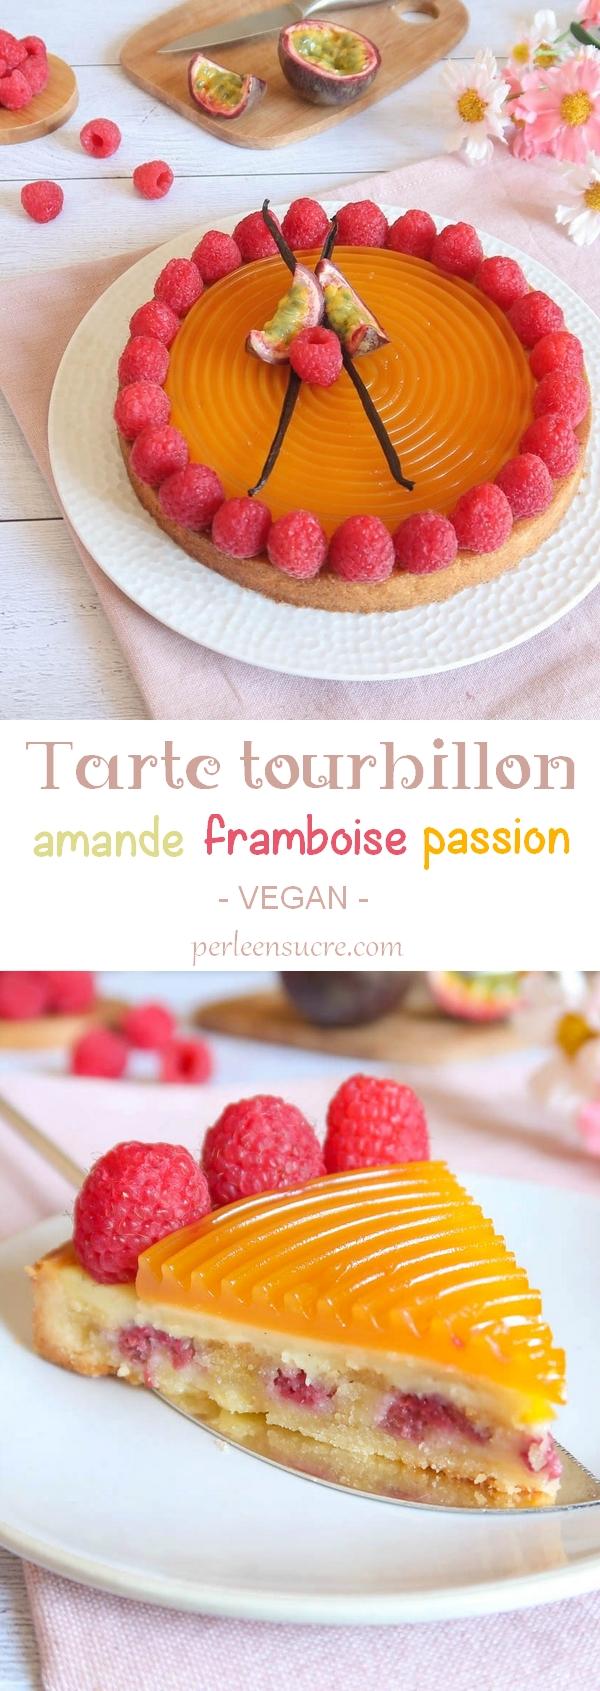 Tarte tourbillon amande framboise passion {vegan}